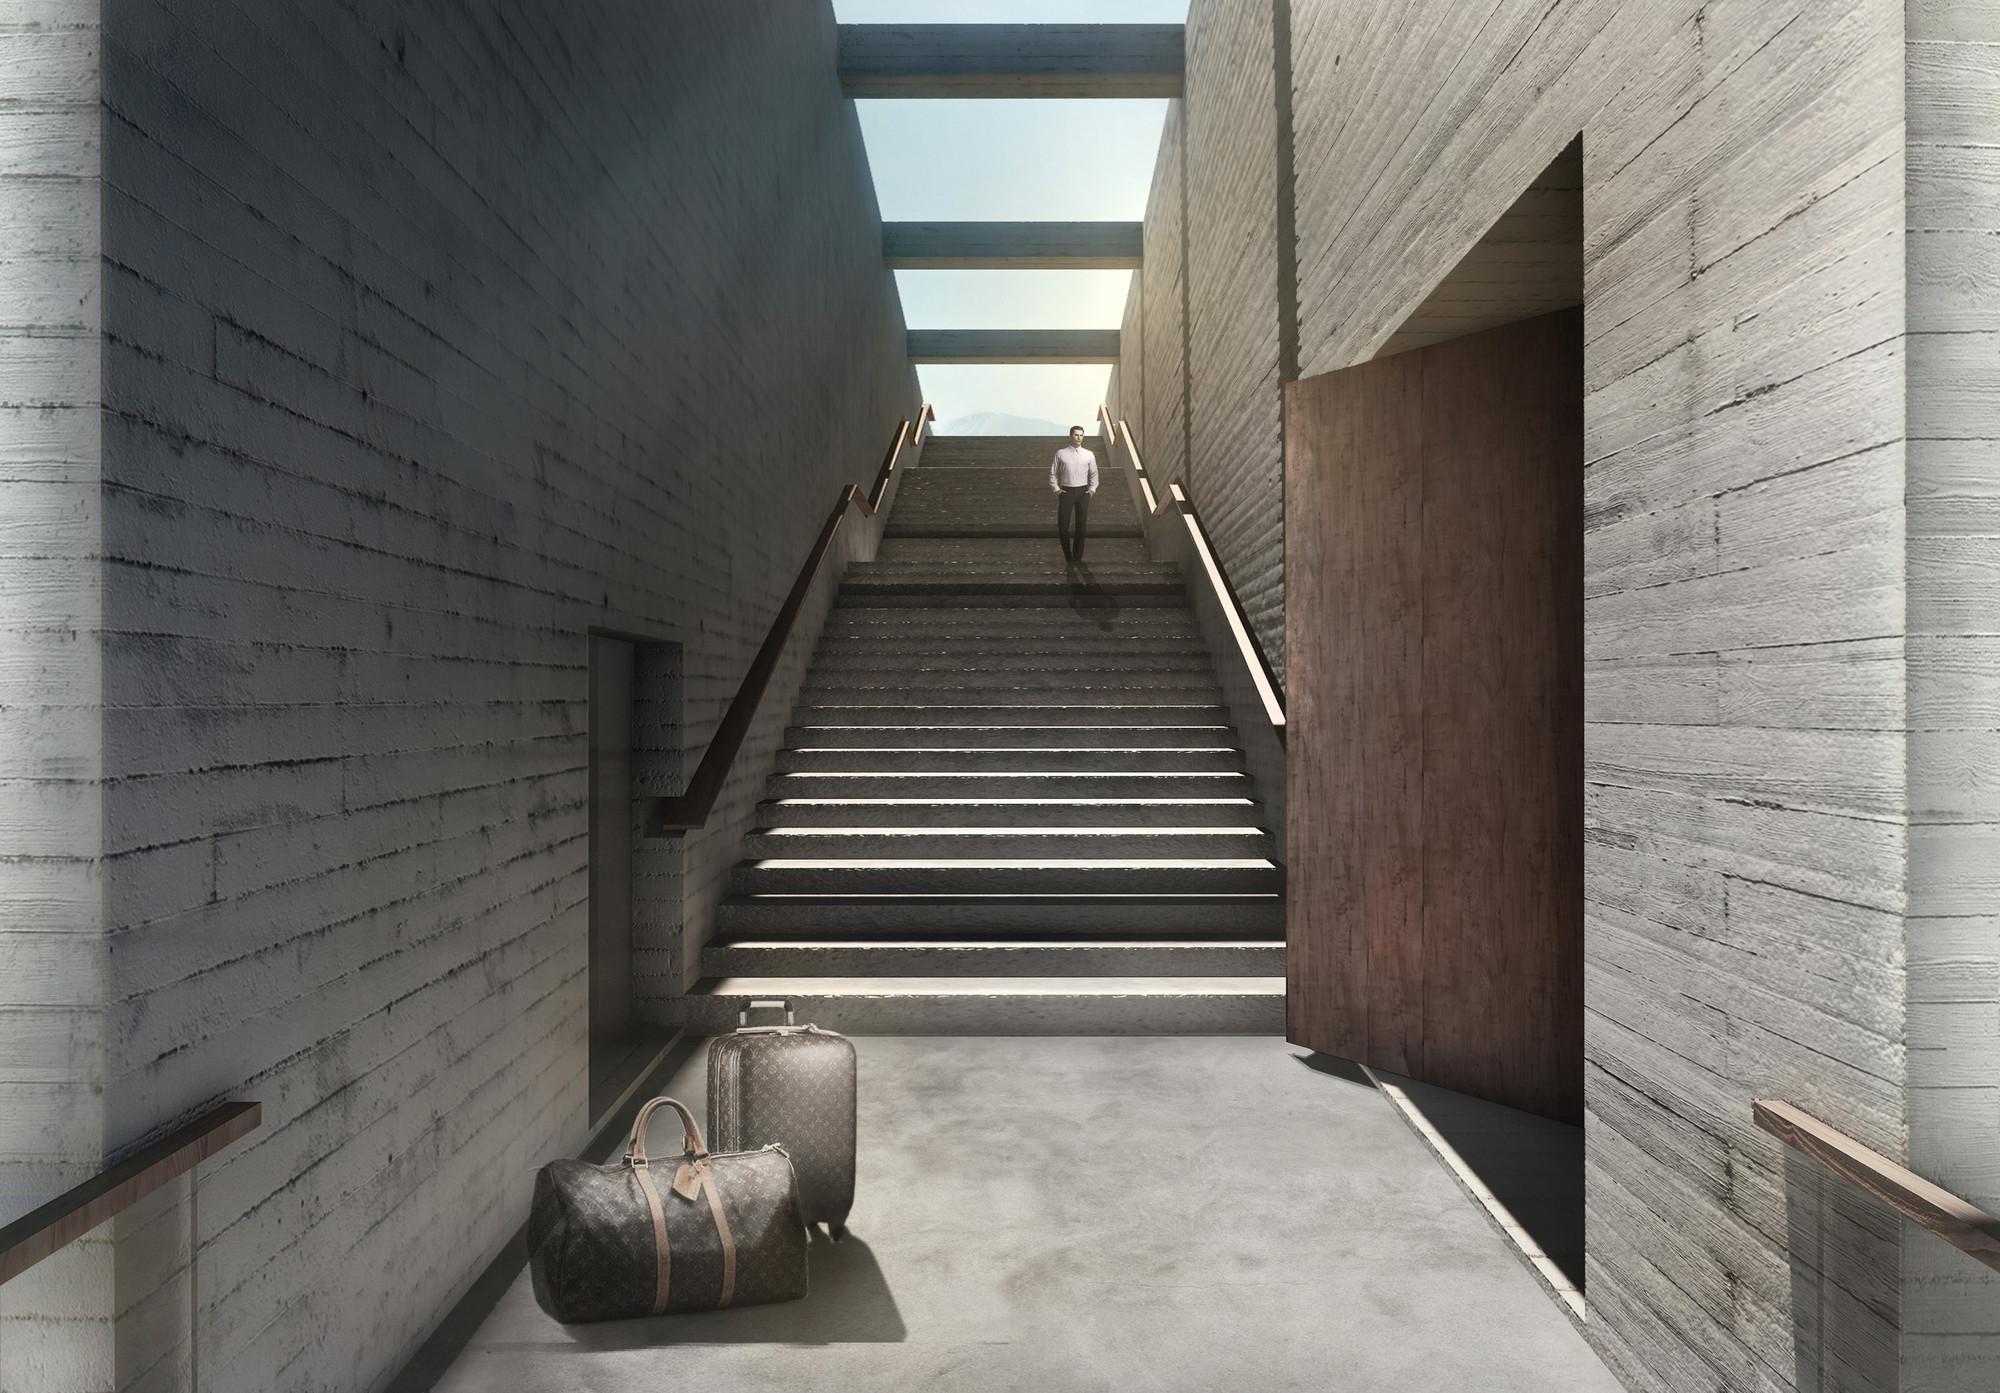 Gallery of live on the edge with opa 39 s casa brutale 12 - Las mejores casas del mundo ...